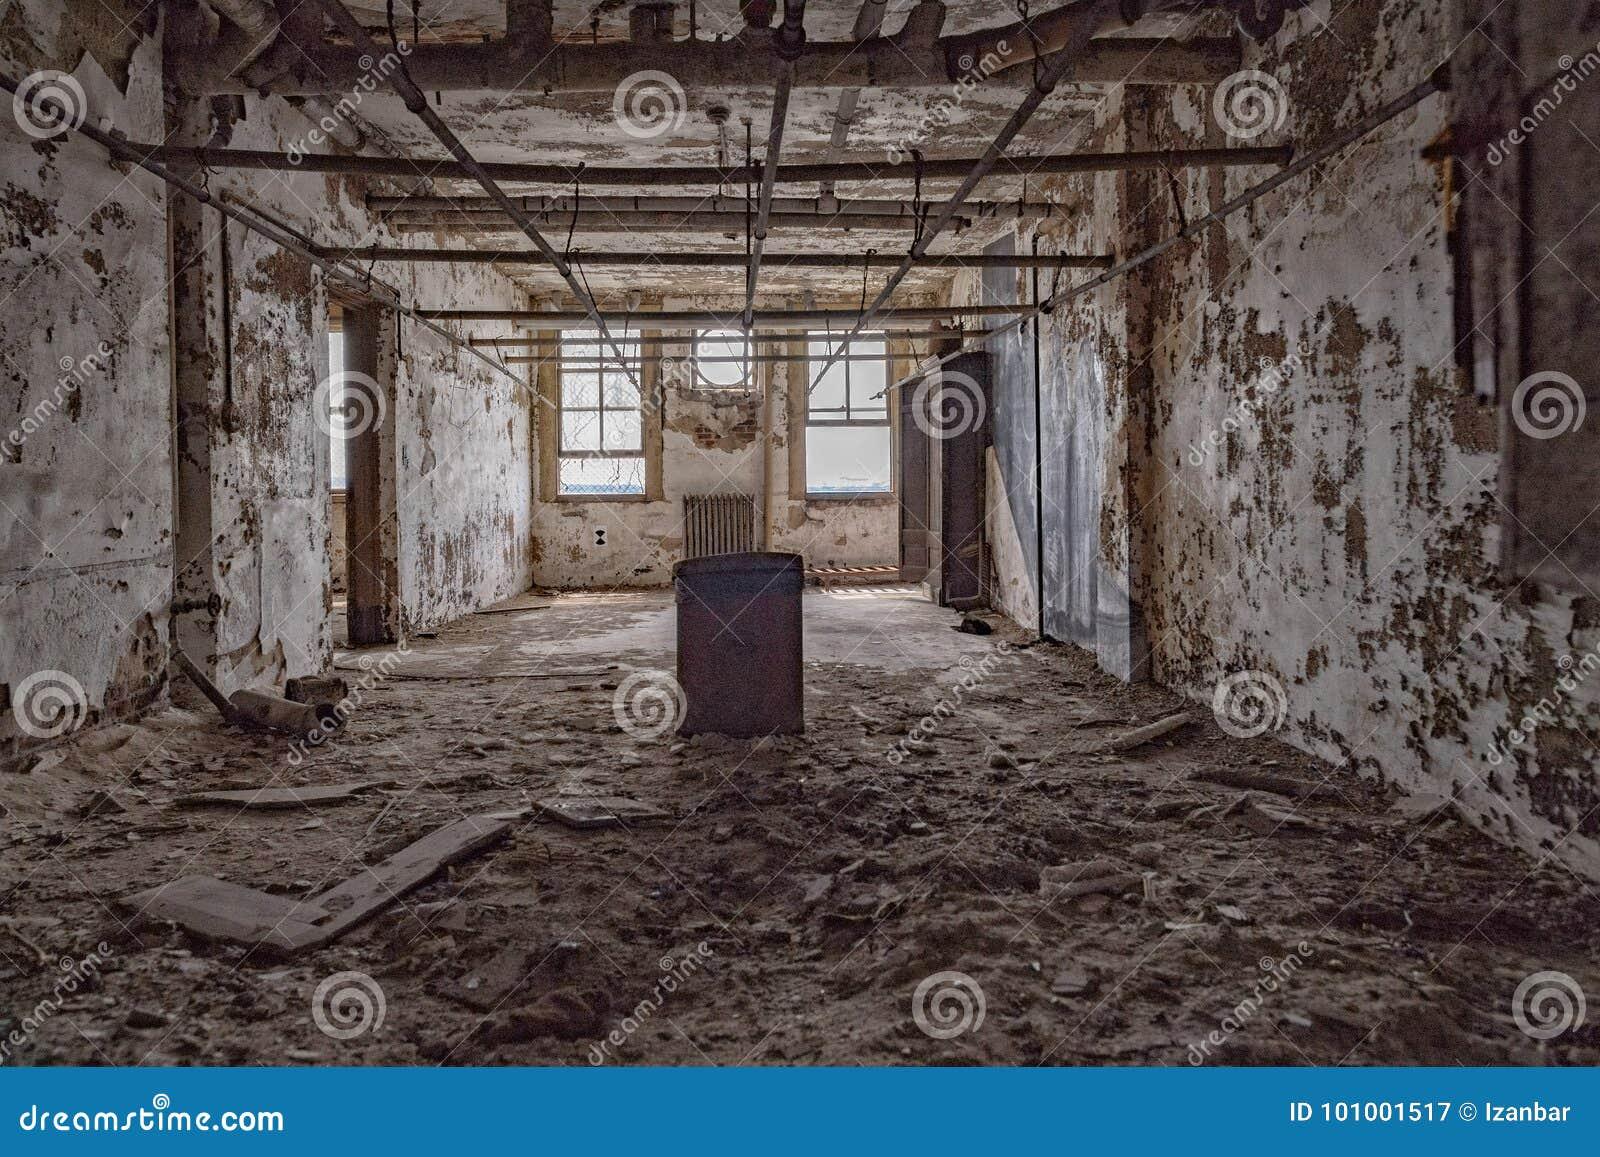 Cuartos abandonados del interior del hospital psiqui trico for La isla interior torrent